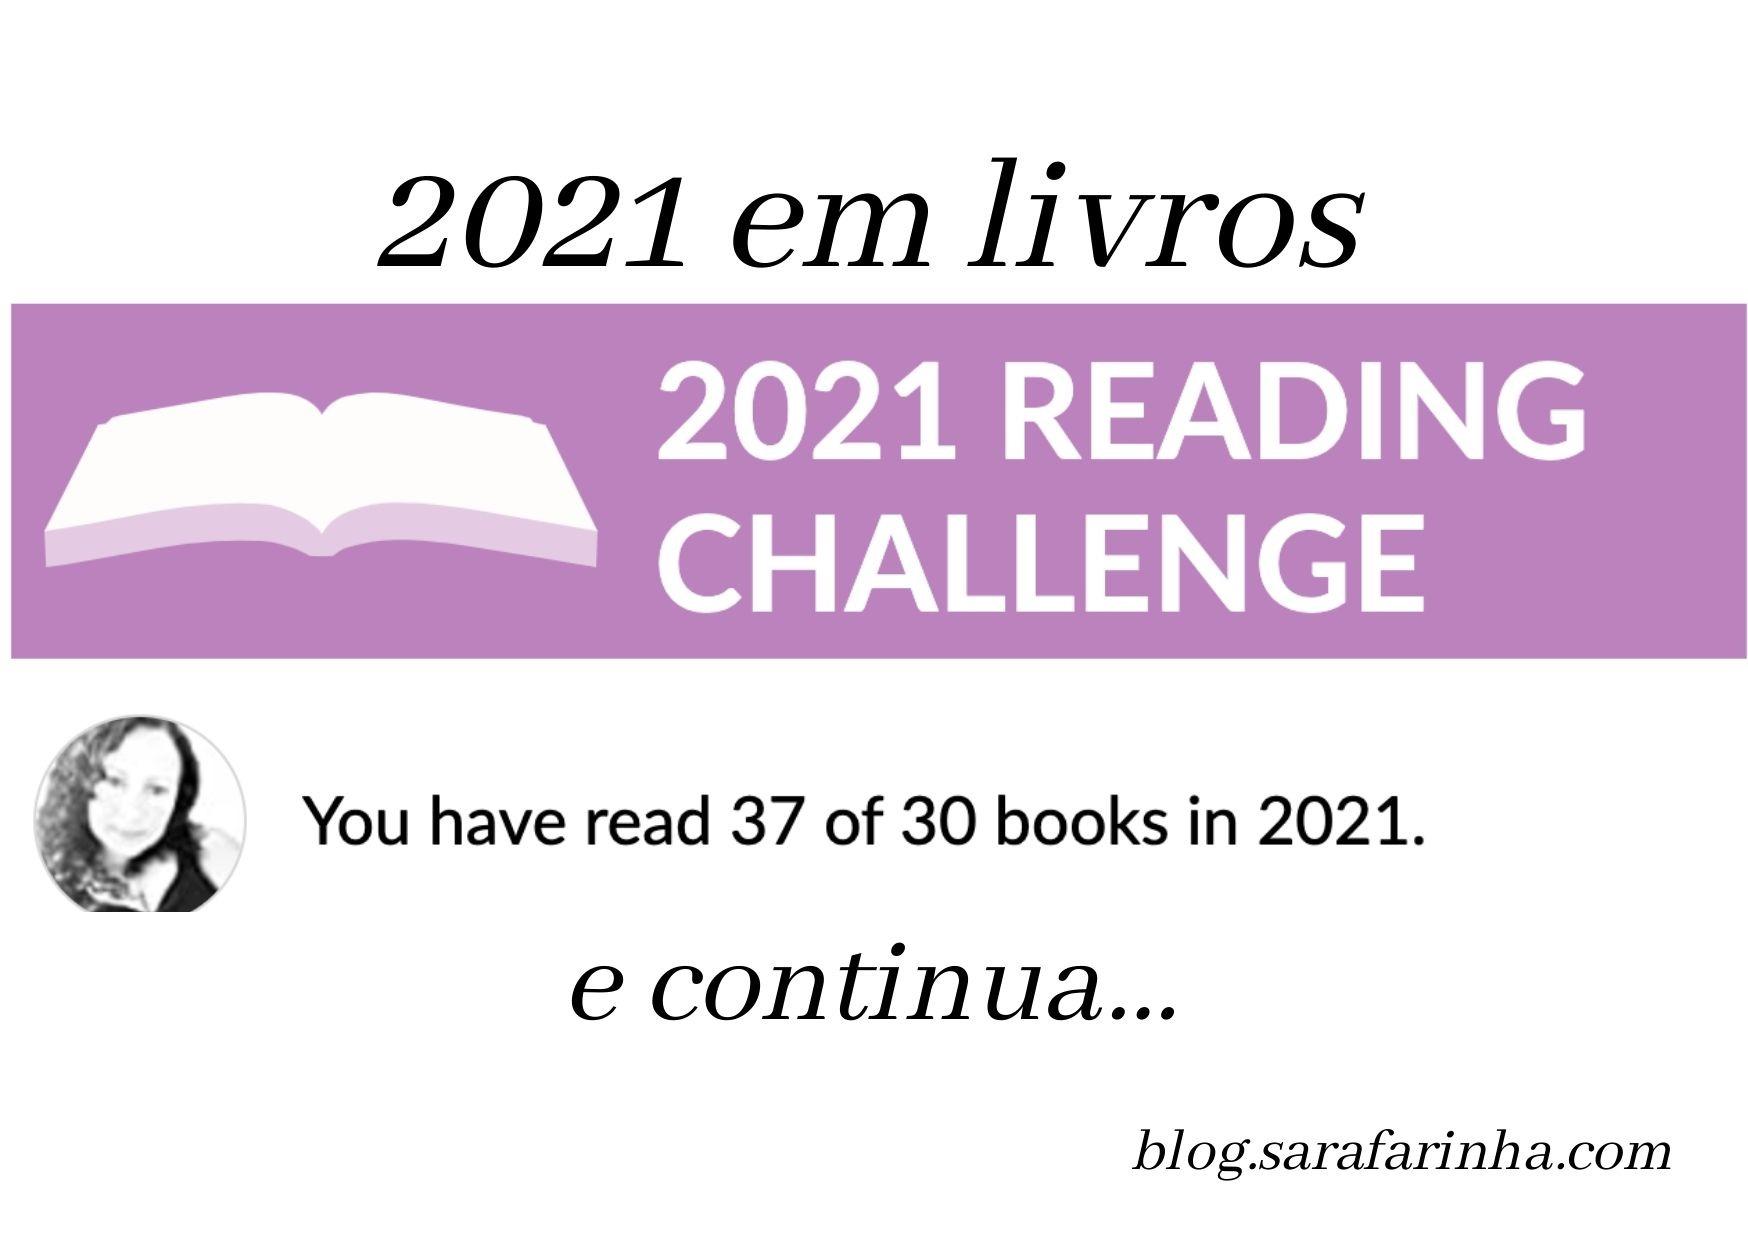 2021 goodreads reading challenge